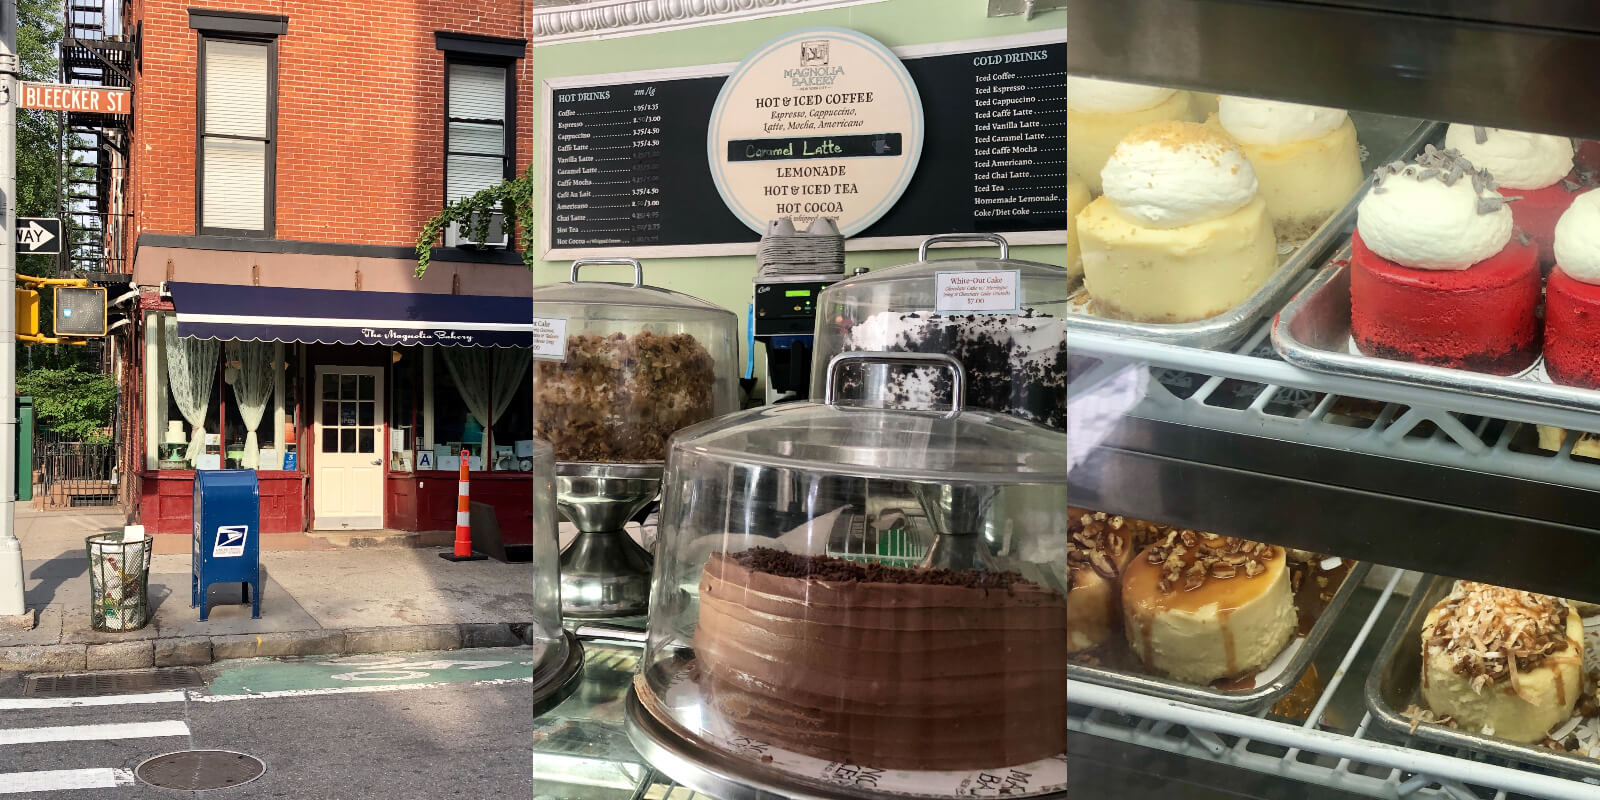 Magnolia Bakery New York Cheesecake Käsekuchen reisen foodie